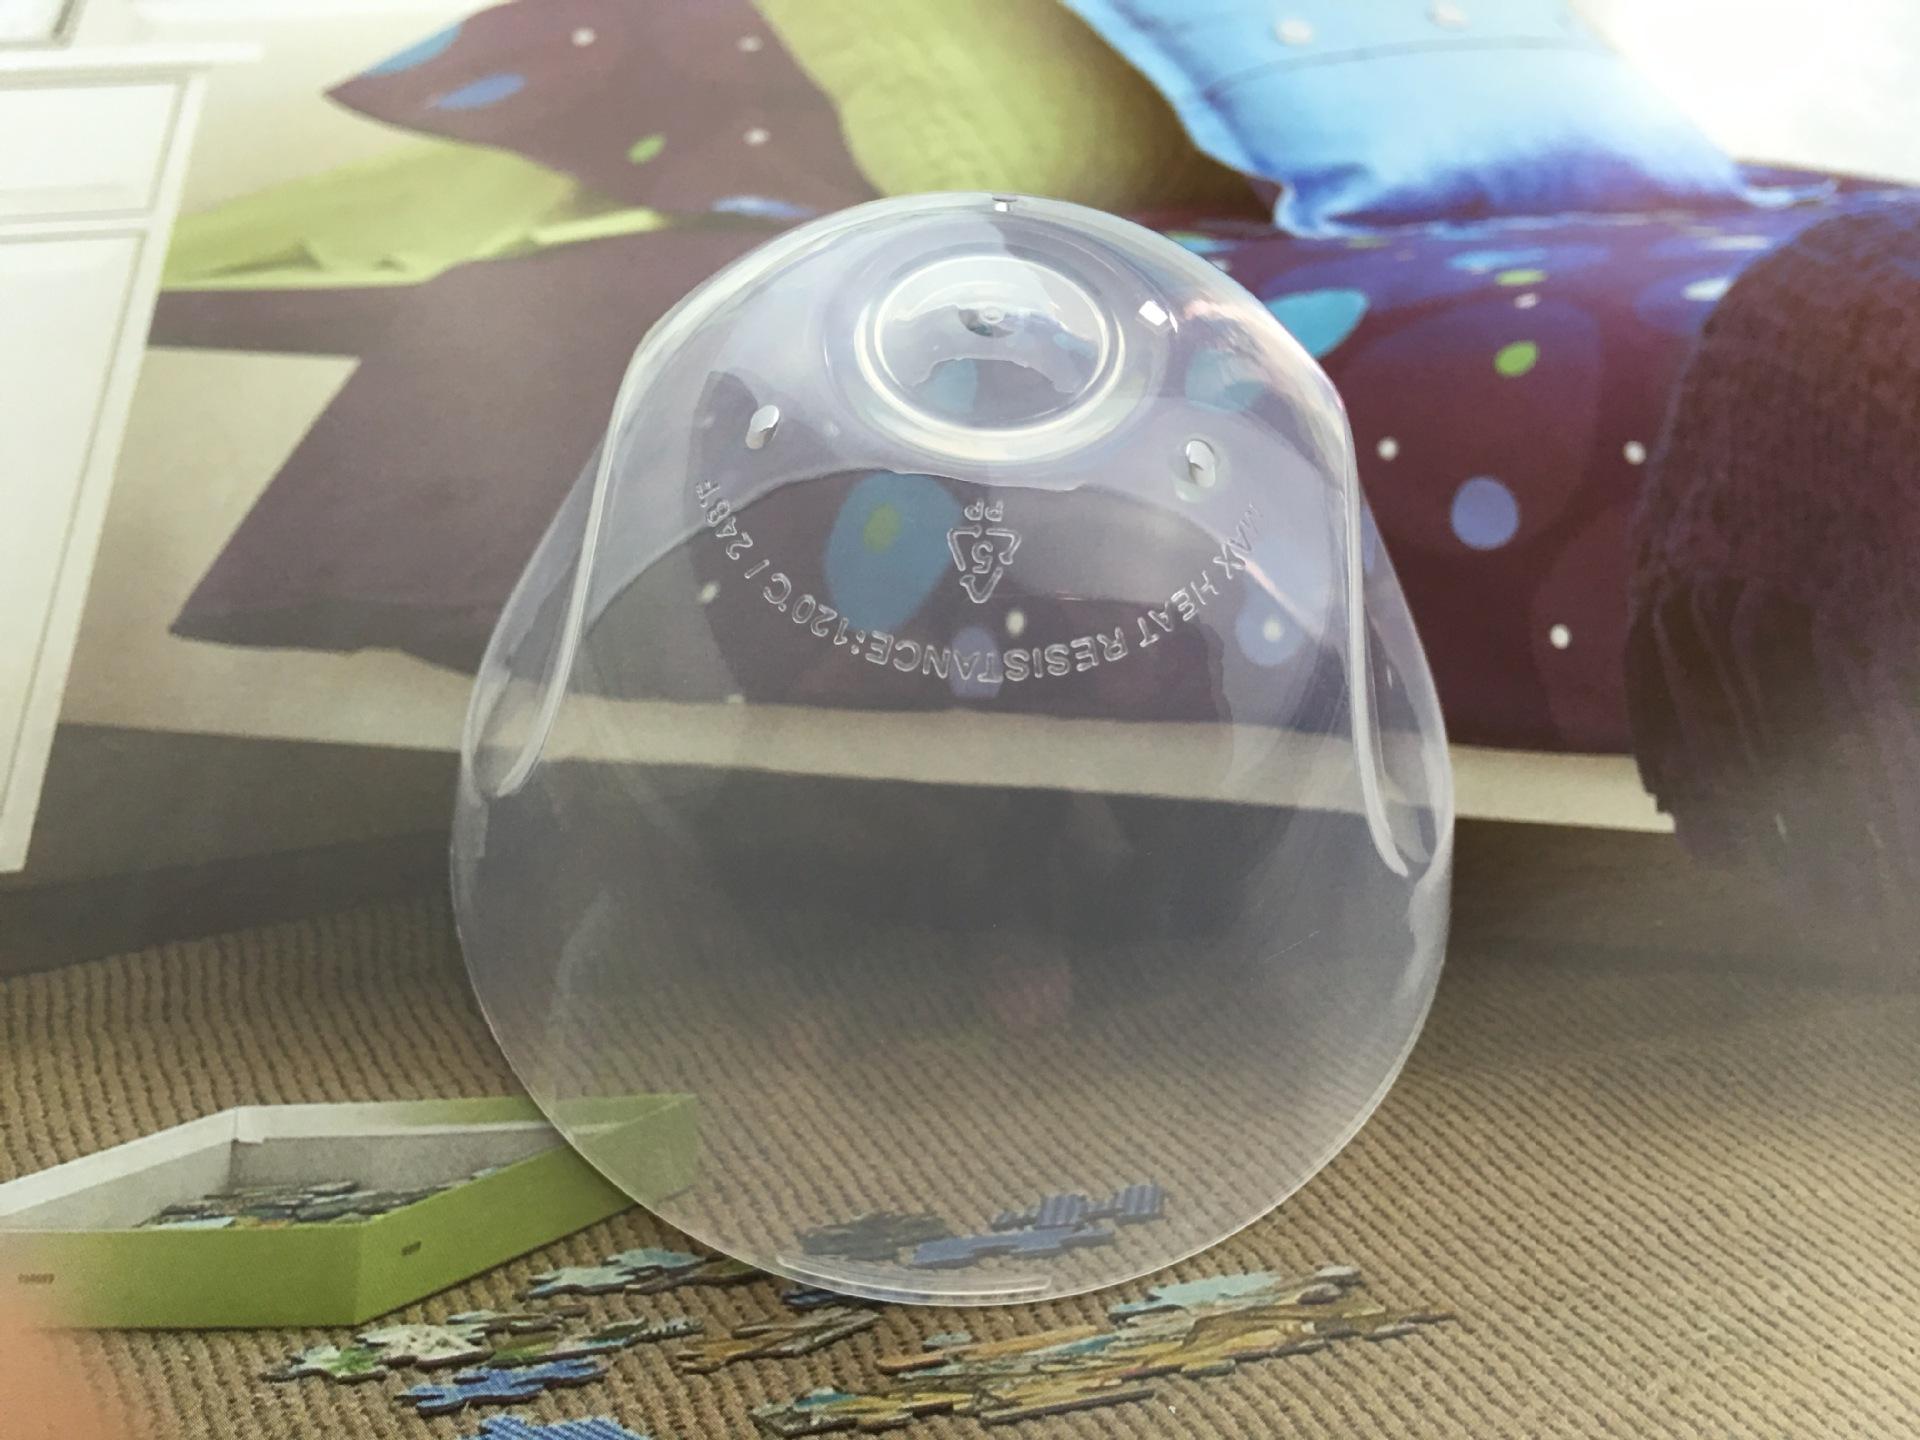 comotomo可么多么适用宽口径奶瓶盖子密封配件可么可多旋盖中间环